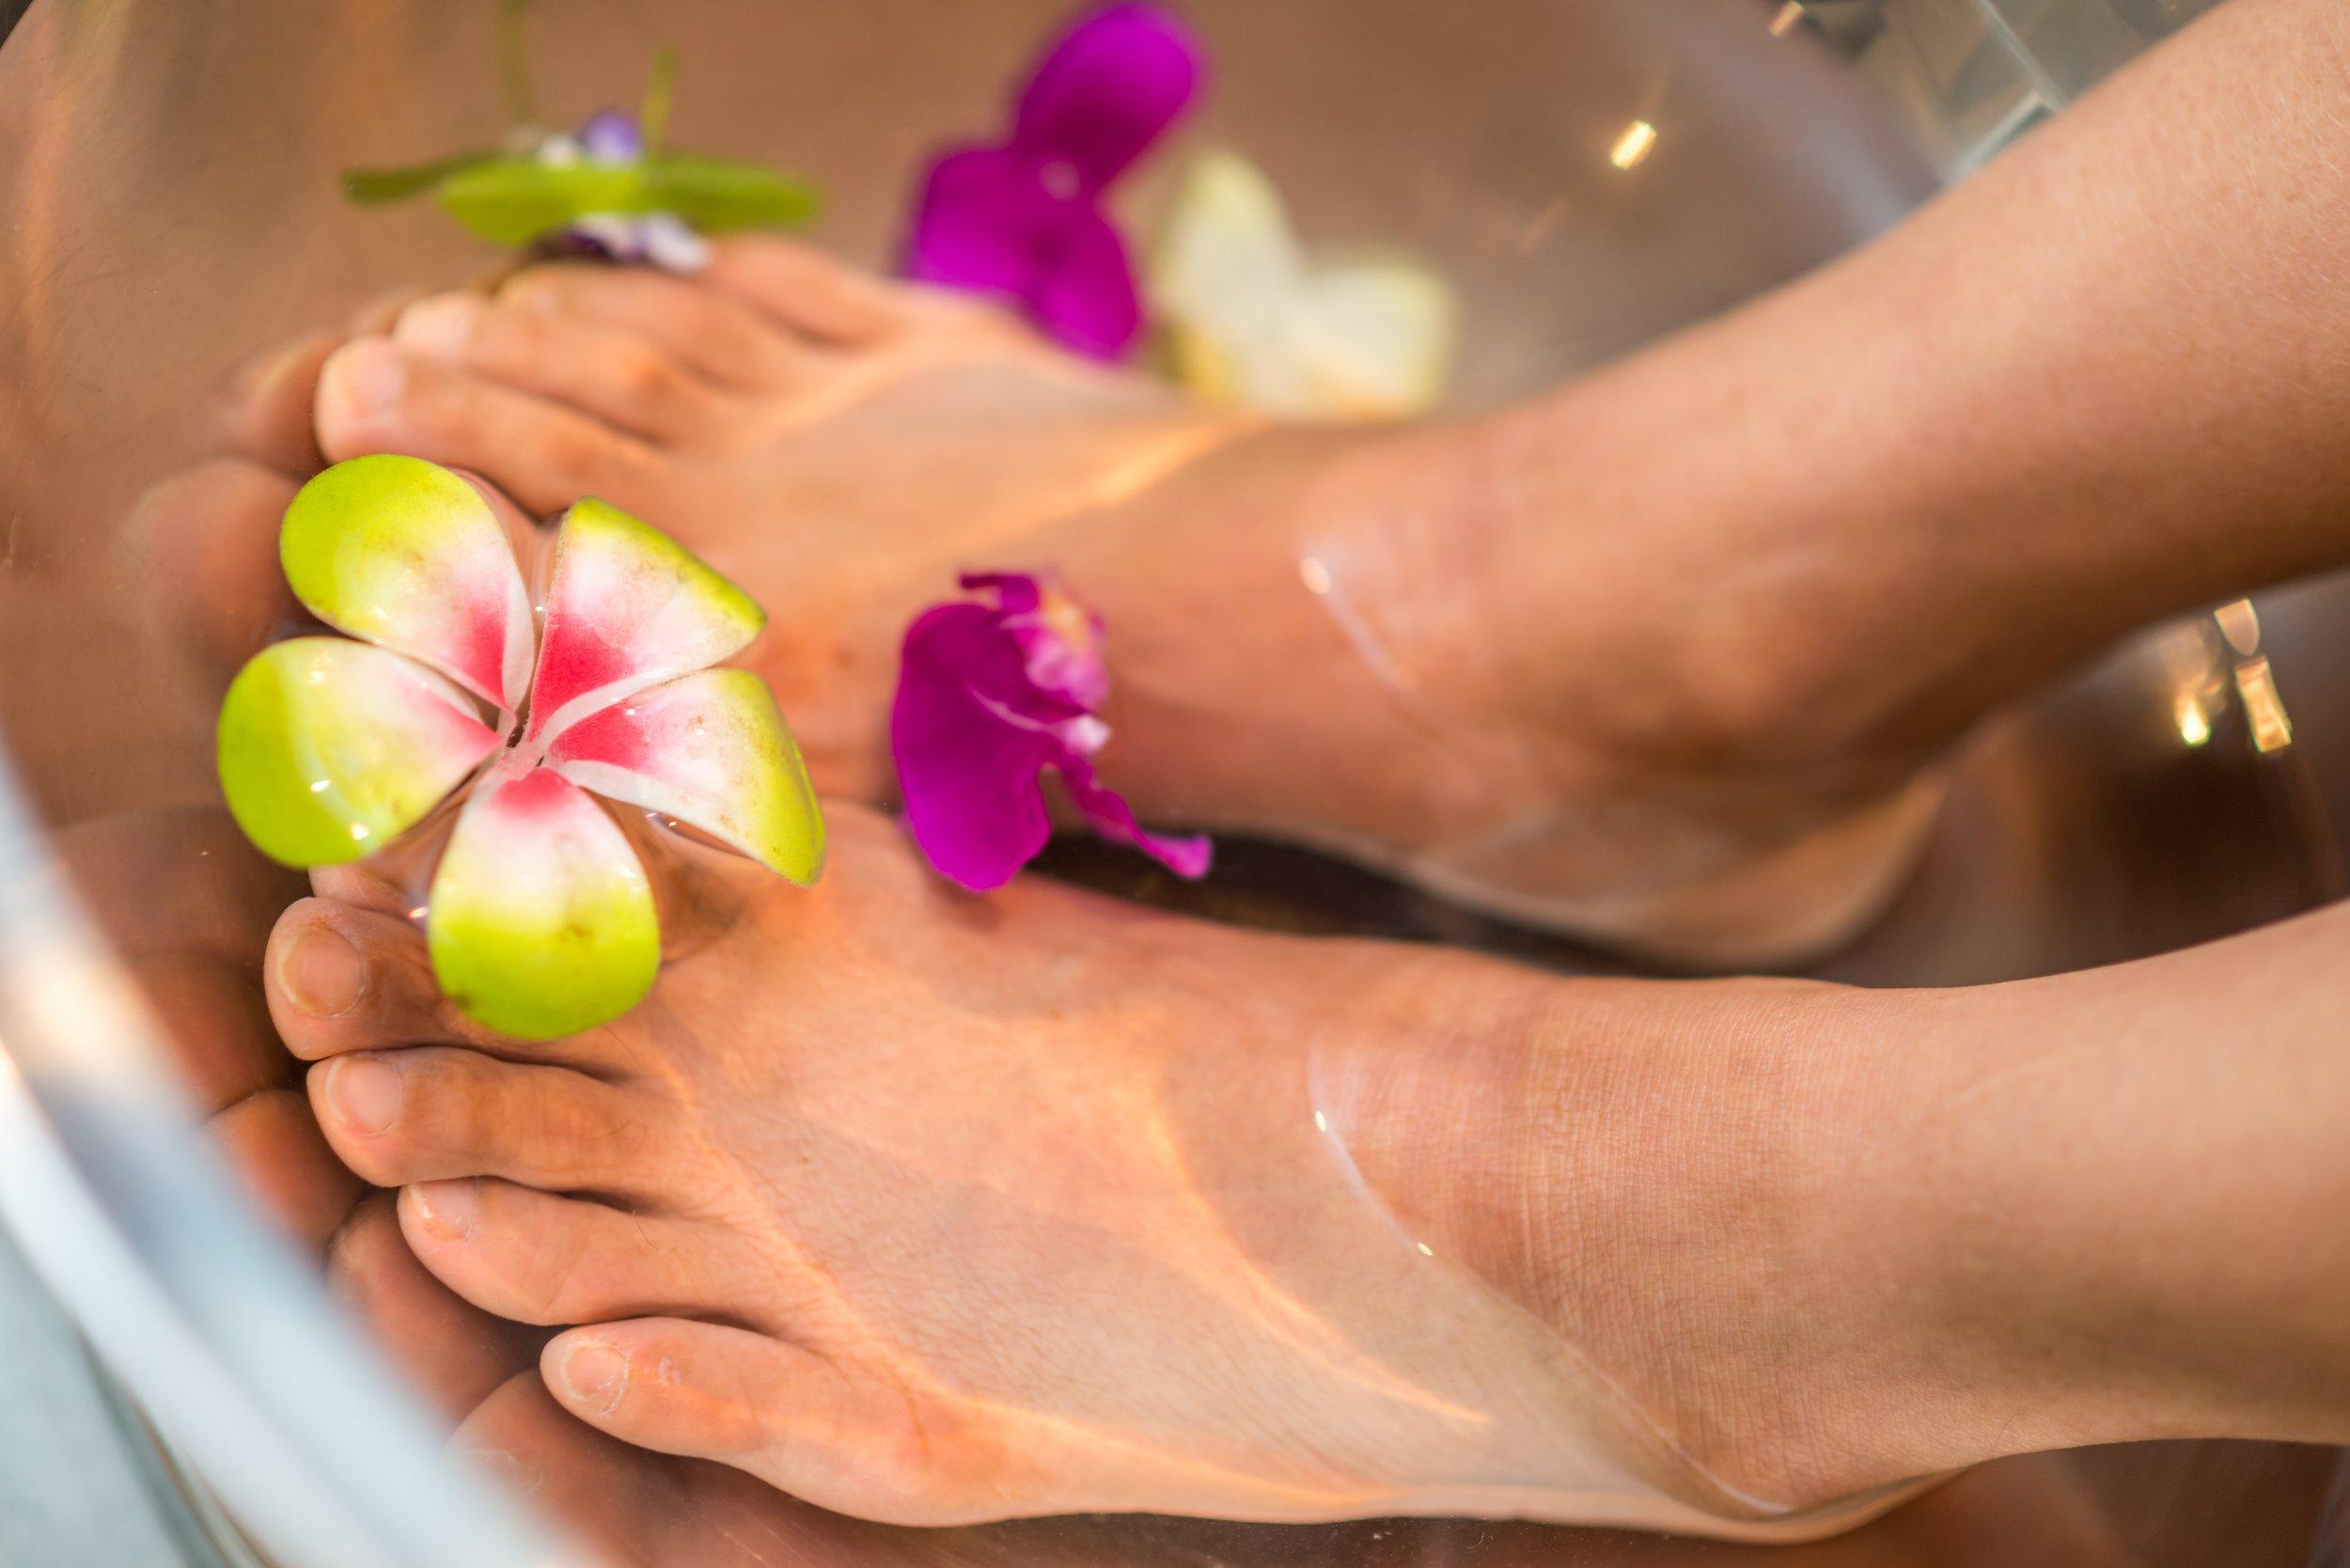 feet pic.jpg